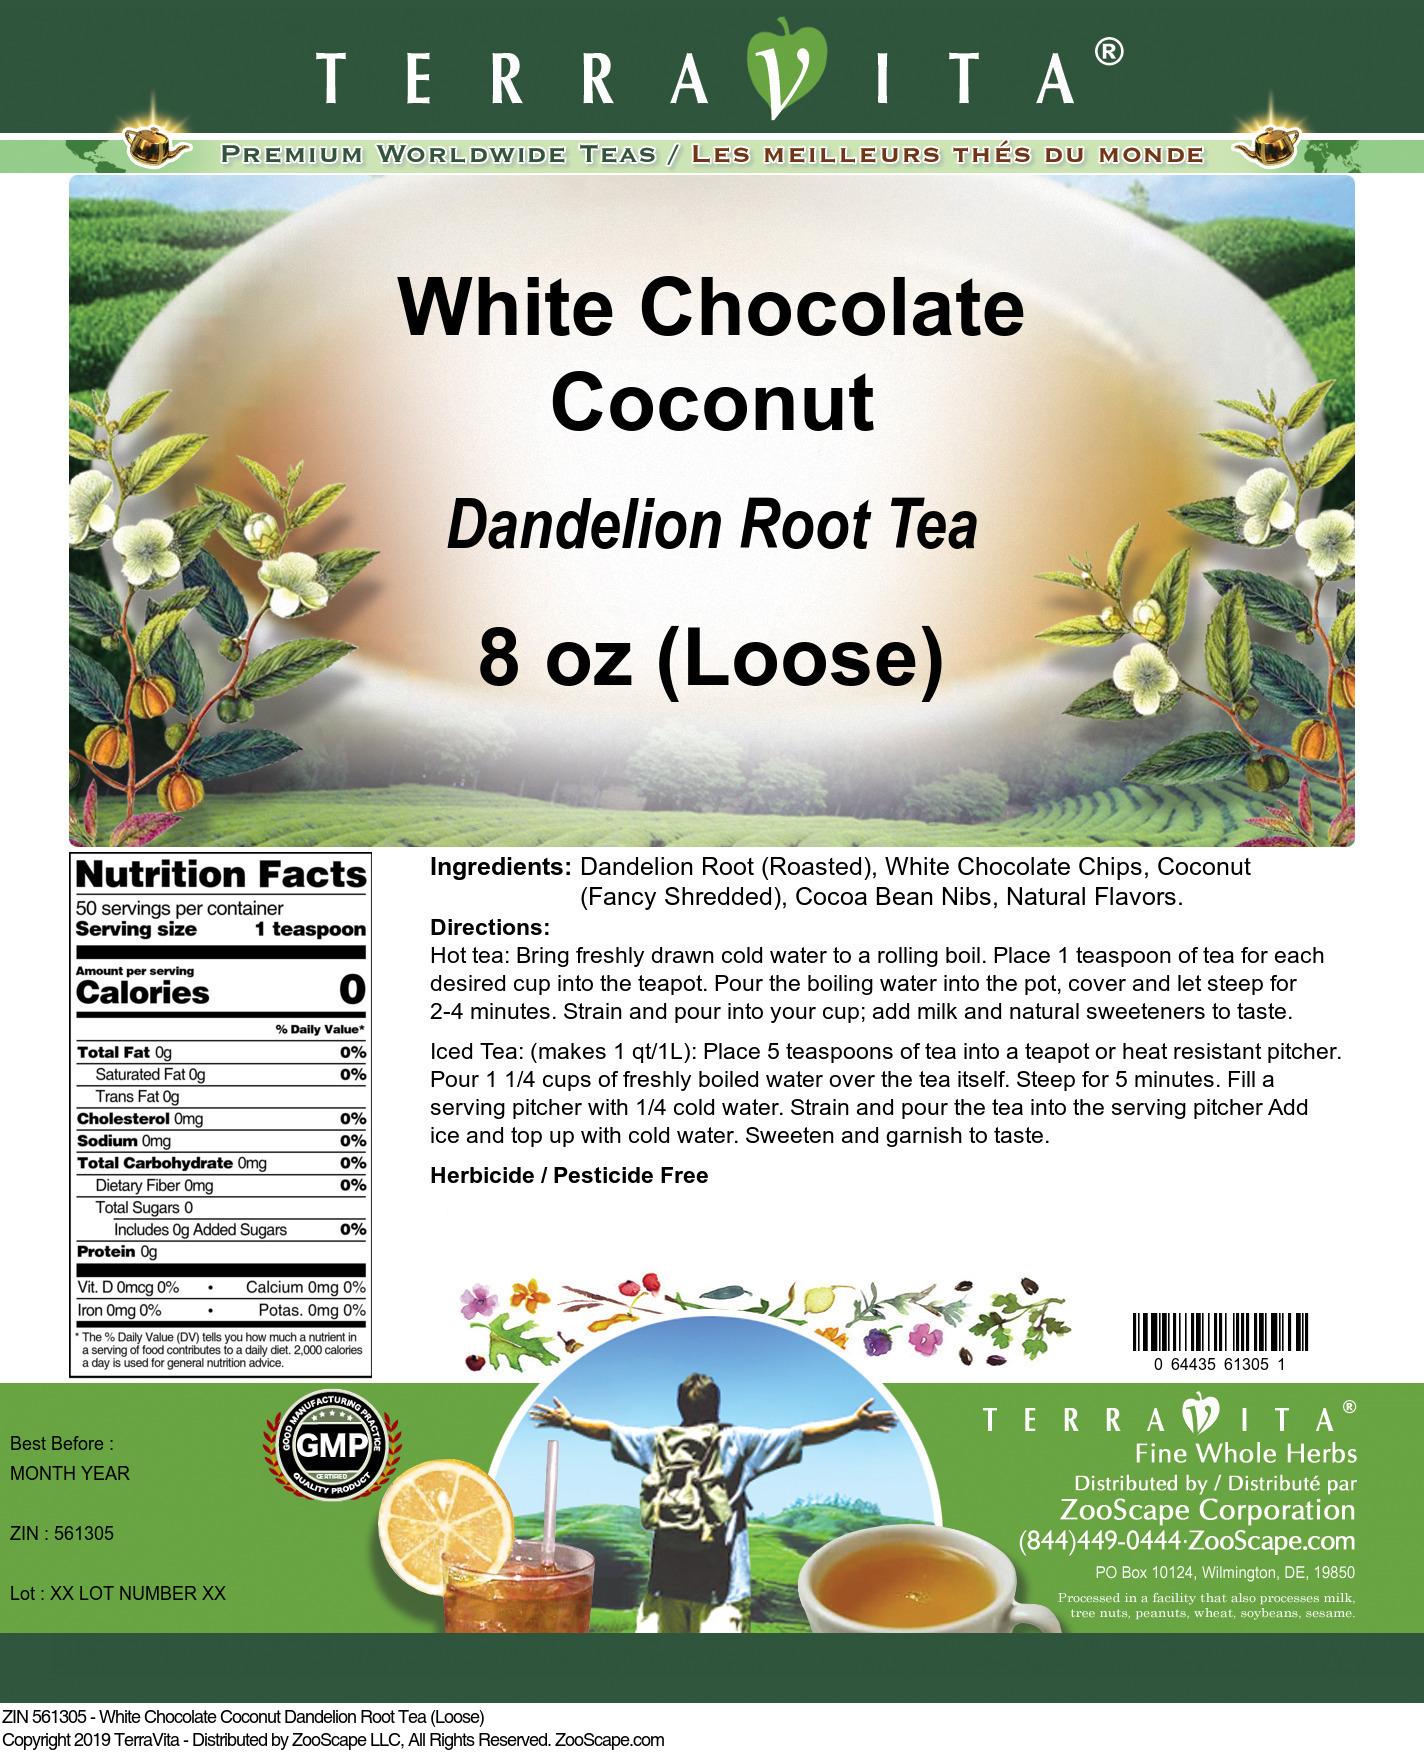 White Chocolate Coconut Dandelion Root Tea (Loose)